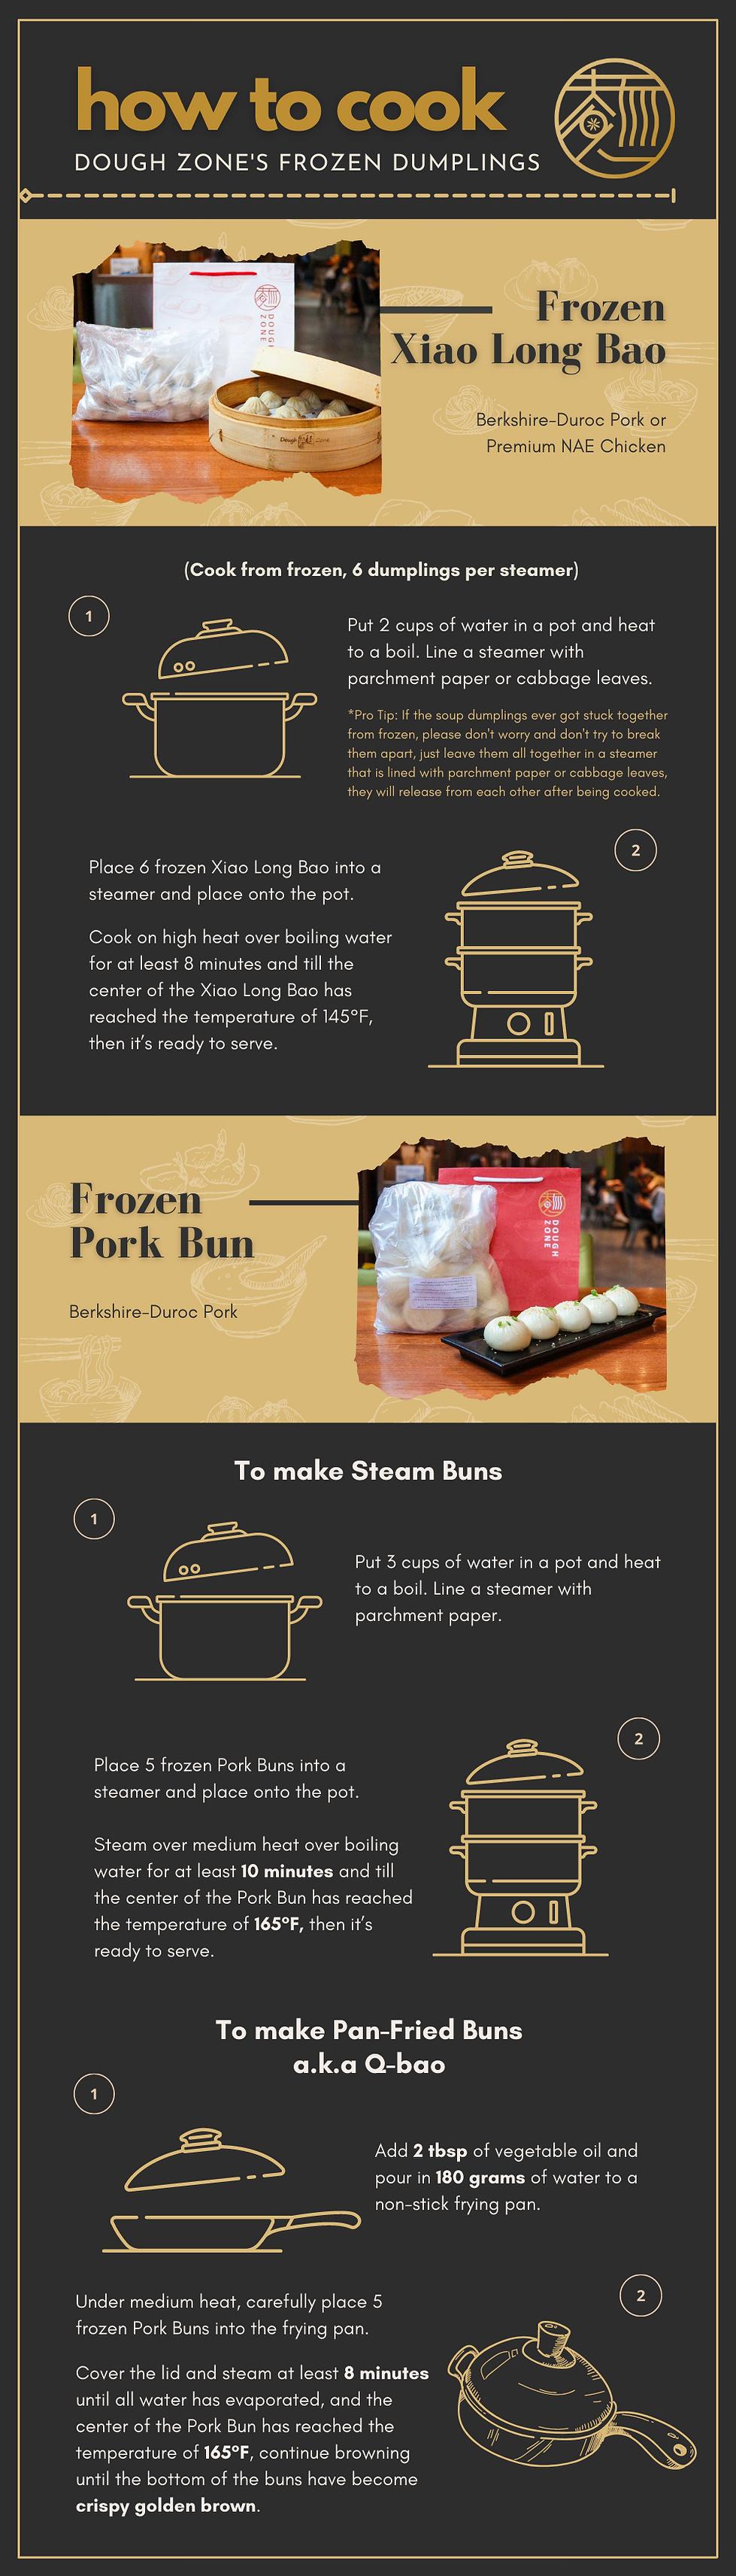 web - frozen dumpling cooking instructions (2).png